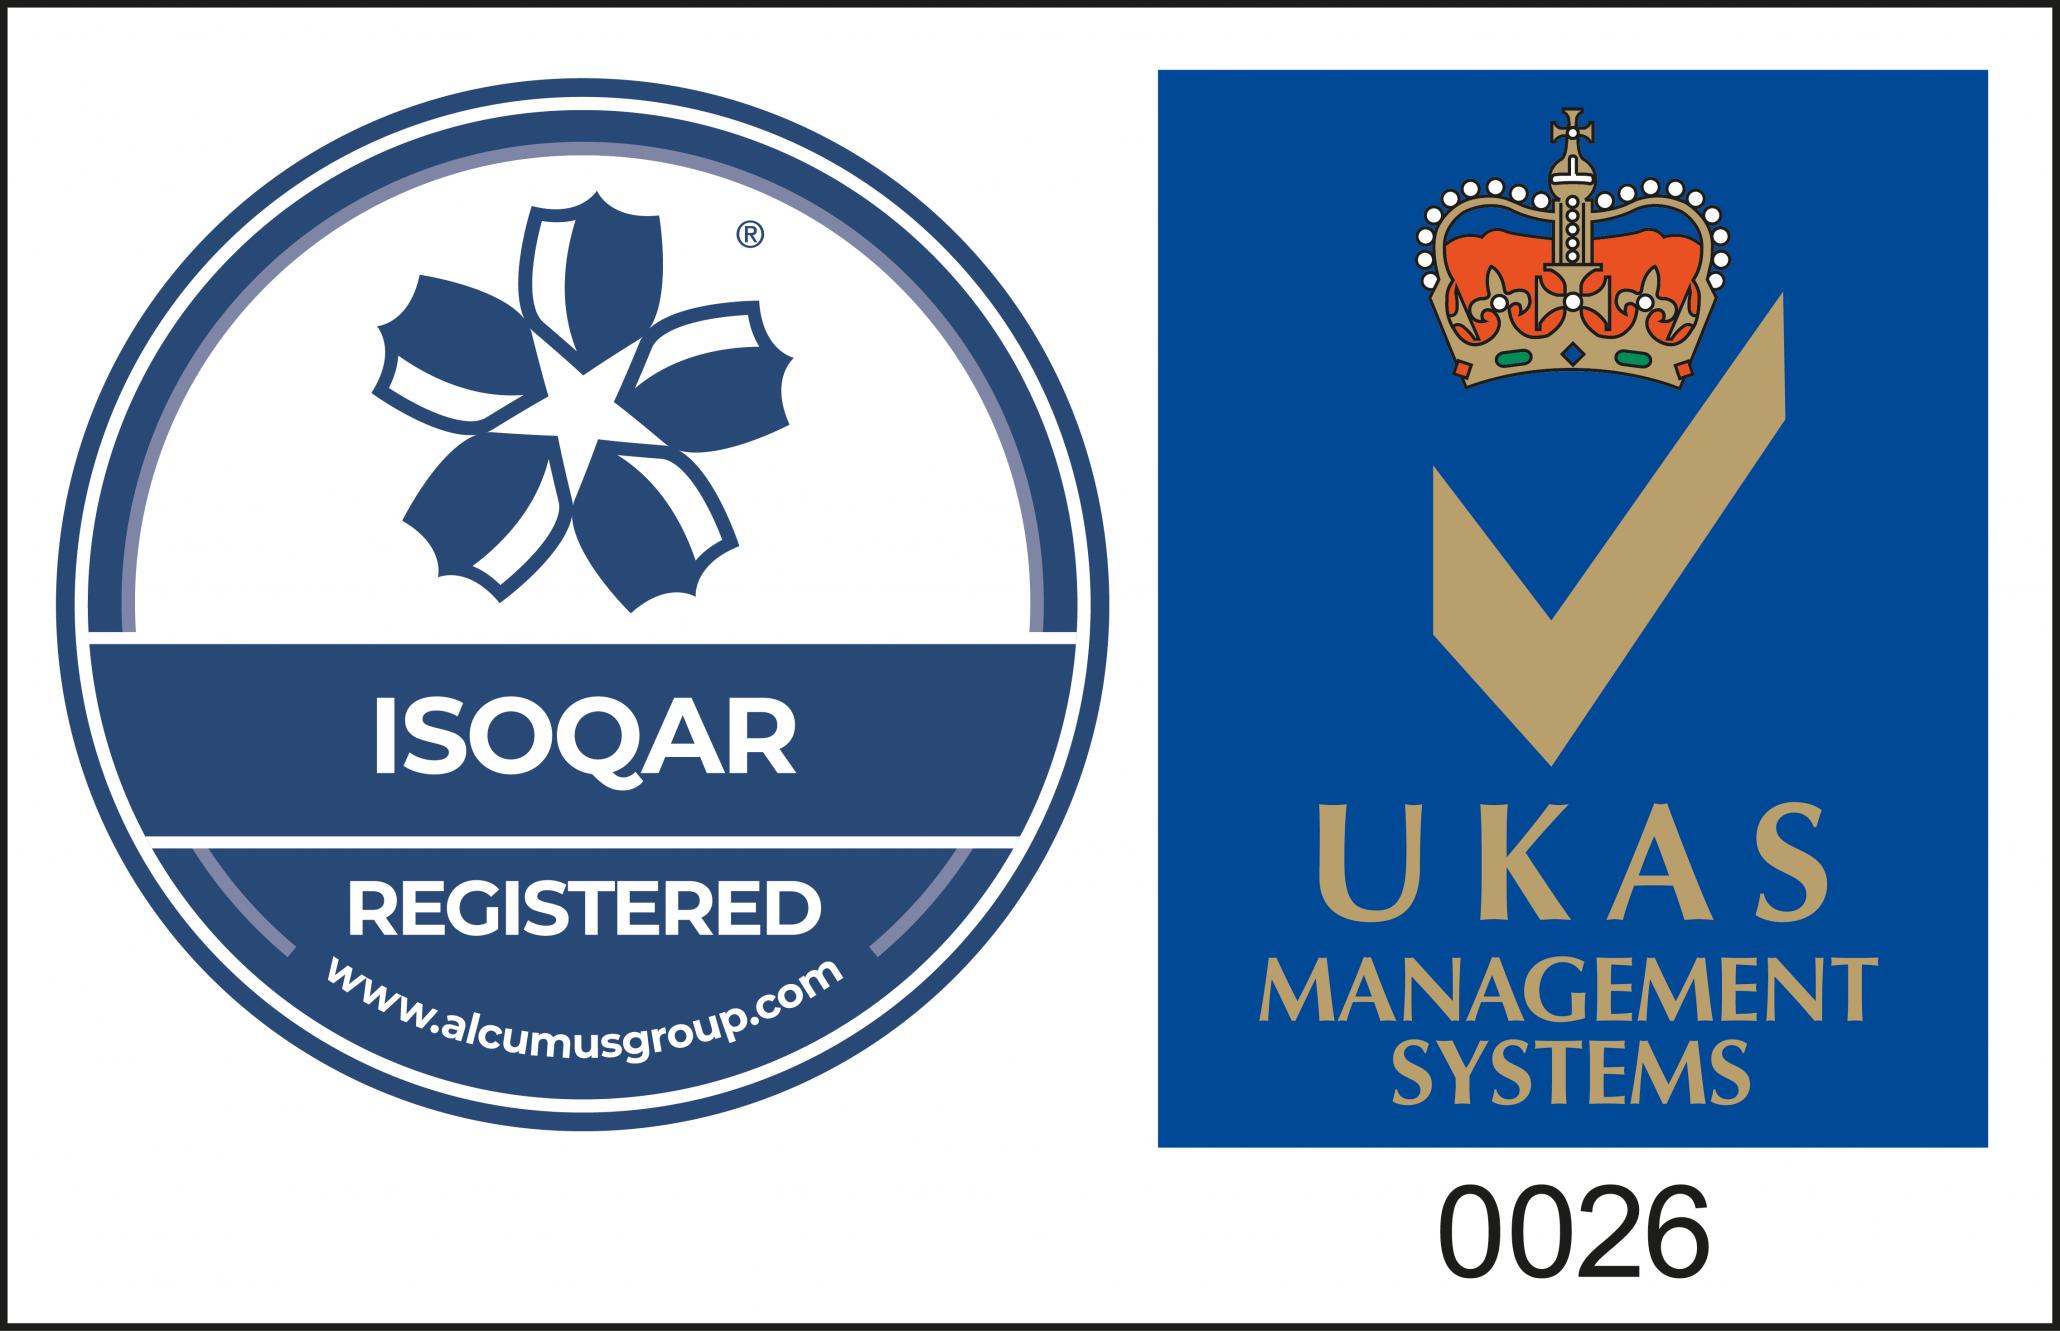 UKAS-ISOQAR-Mark-cl-27